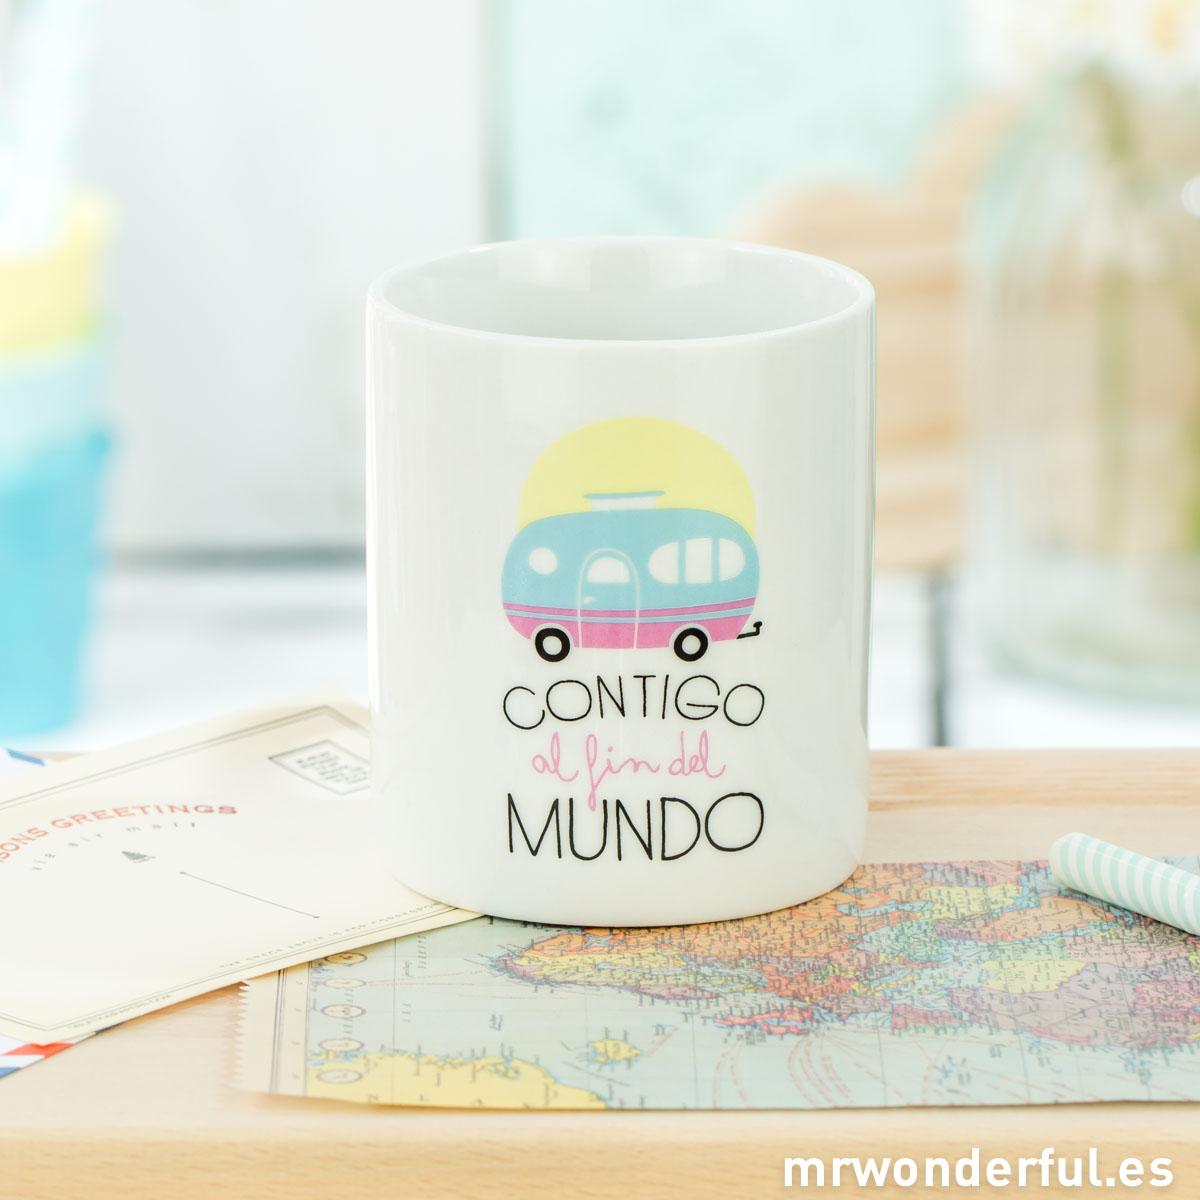 Mrwonderful_WON96_contigo-fin-mundo-8